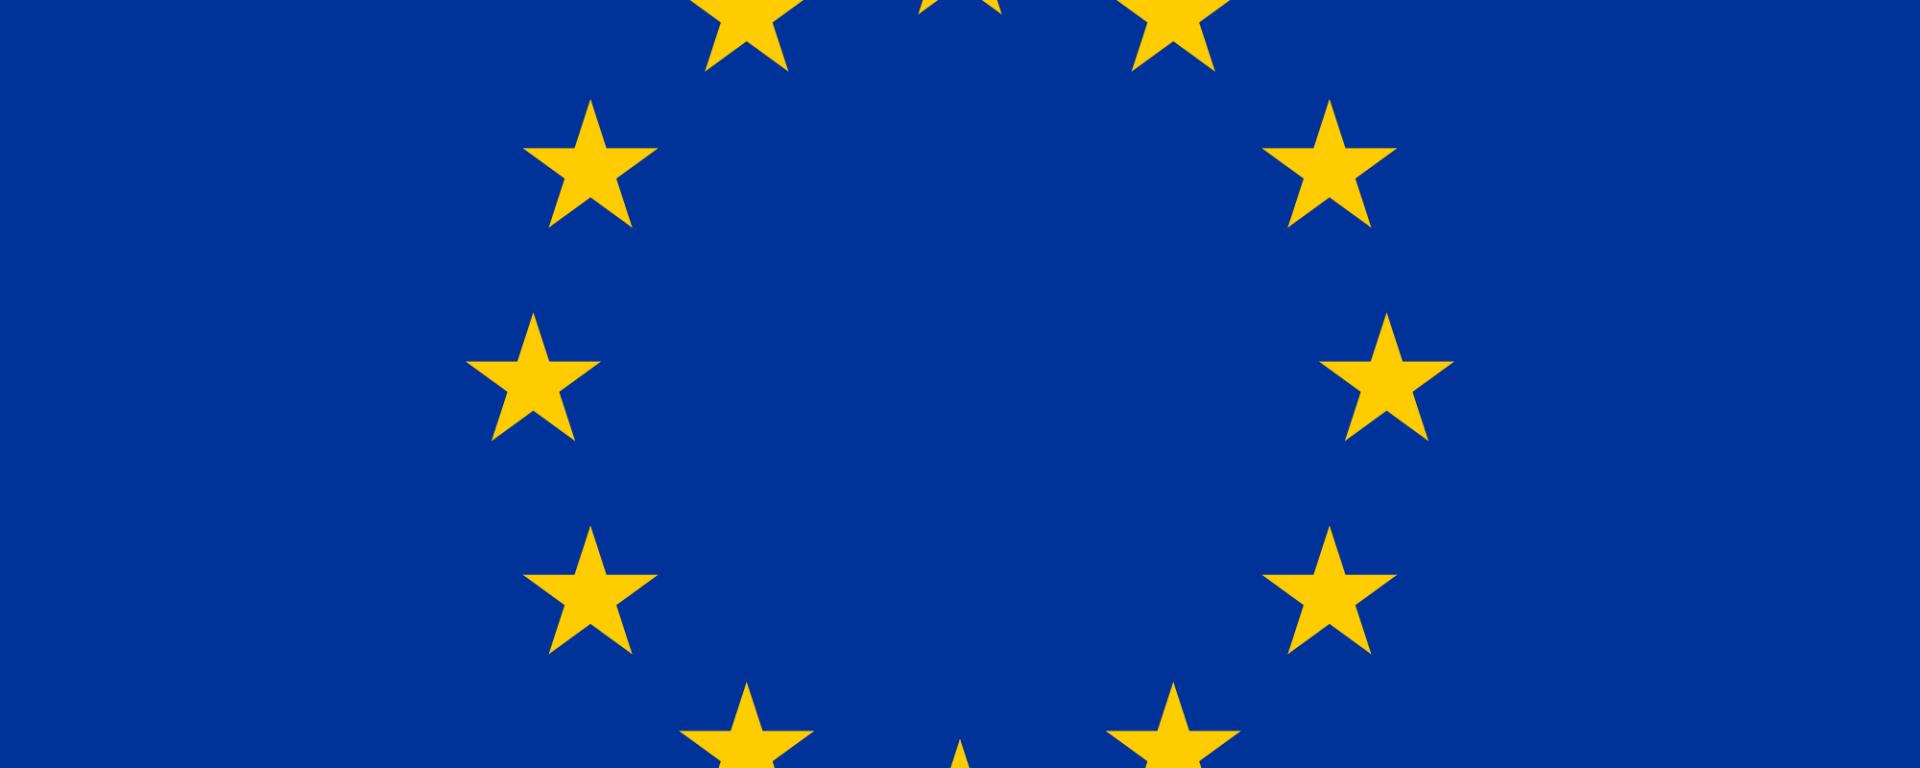 Flag_of_Europe.svg